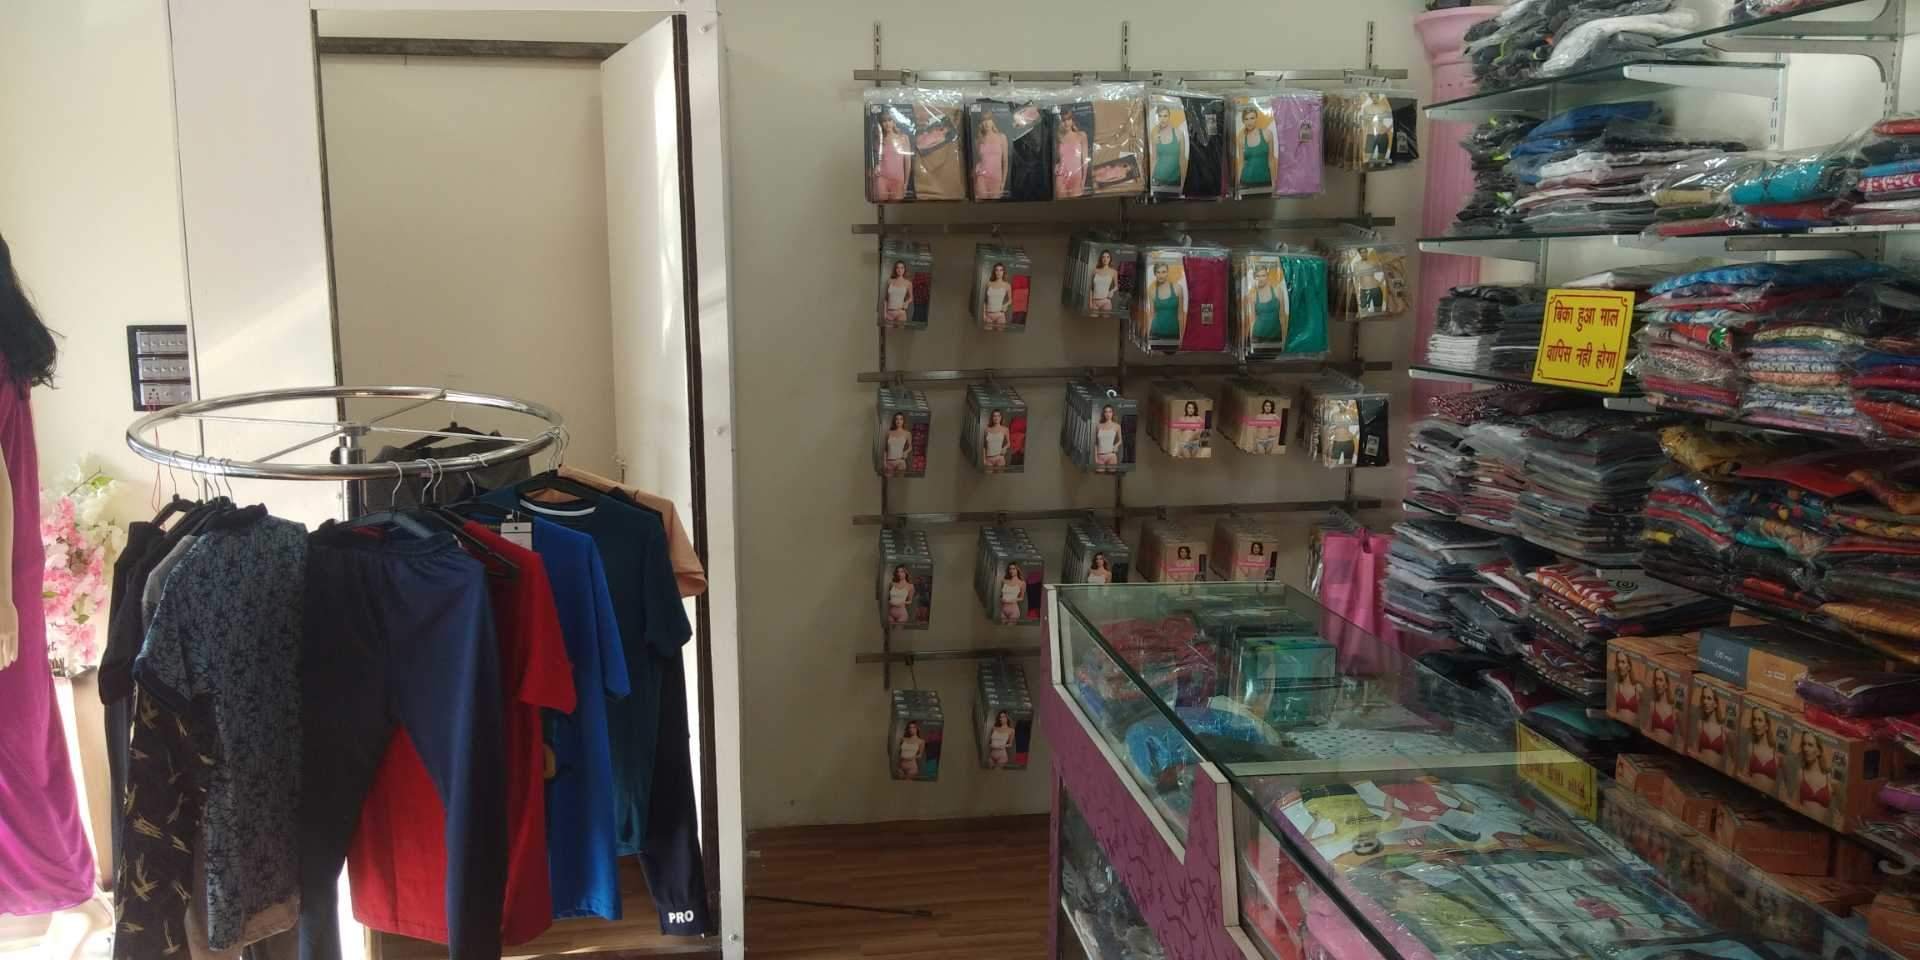 dccdcc7453c Top 100 Gents Readymade Garment Retailers in Viman Nagar - Best ...